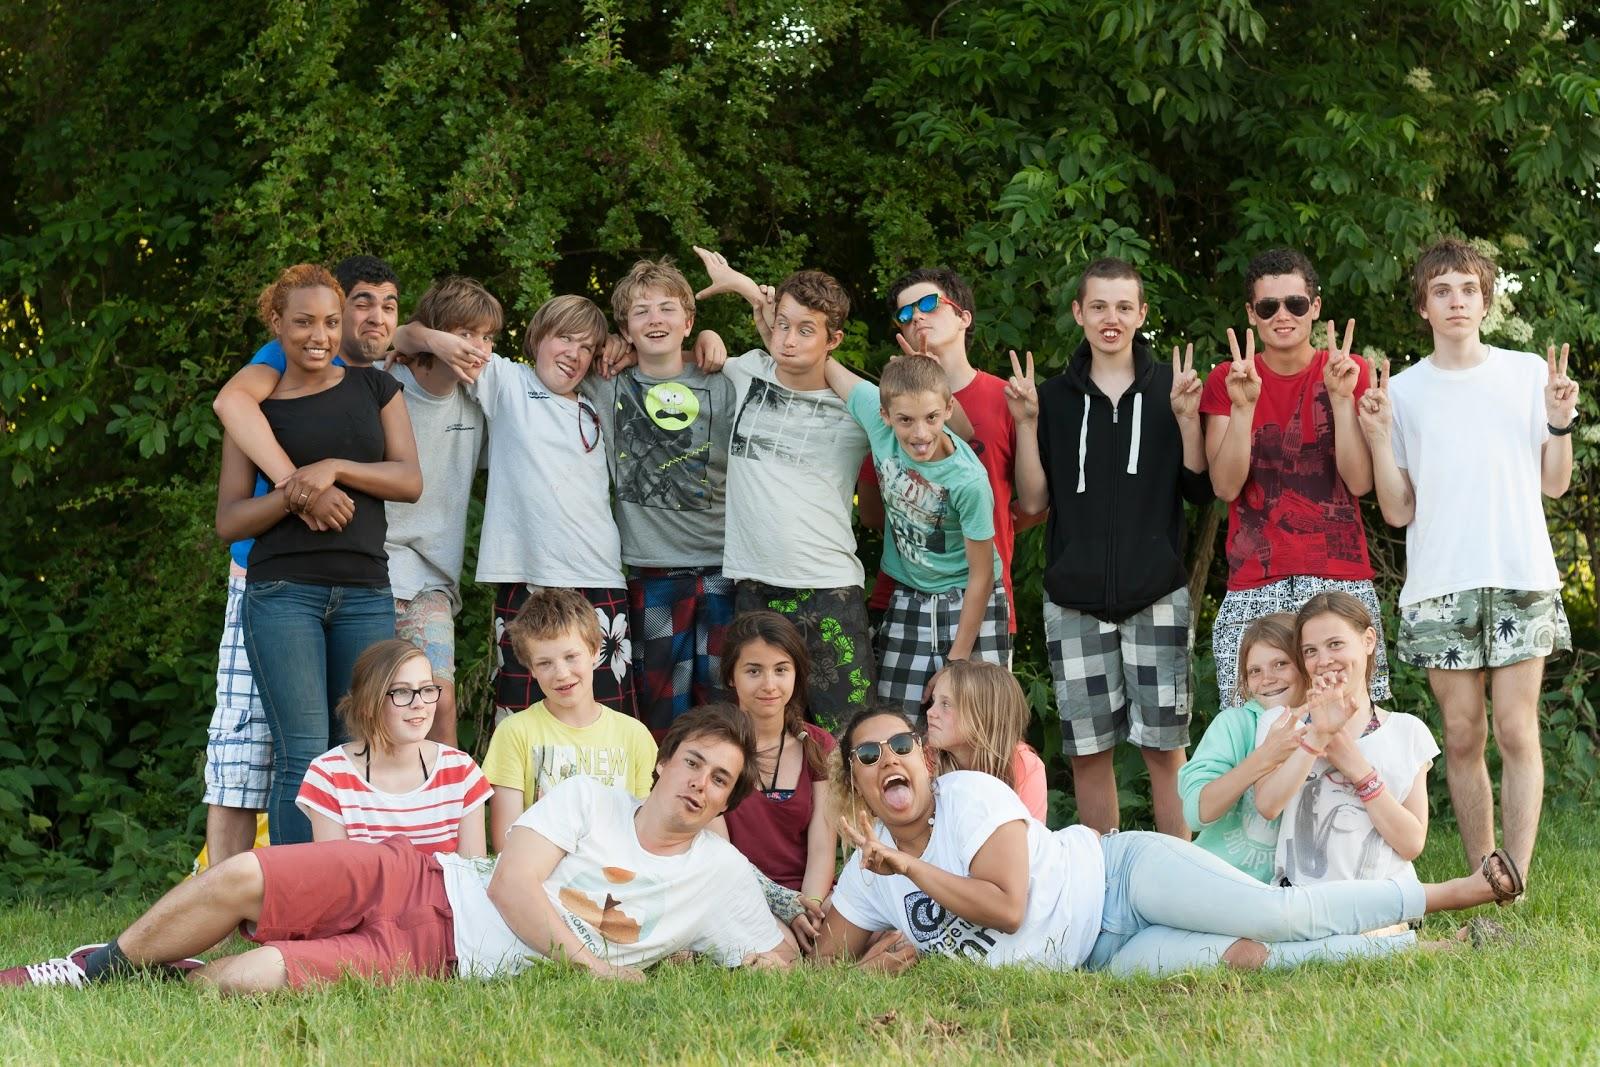 2014 - Pinksterkamp